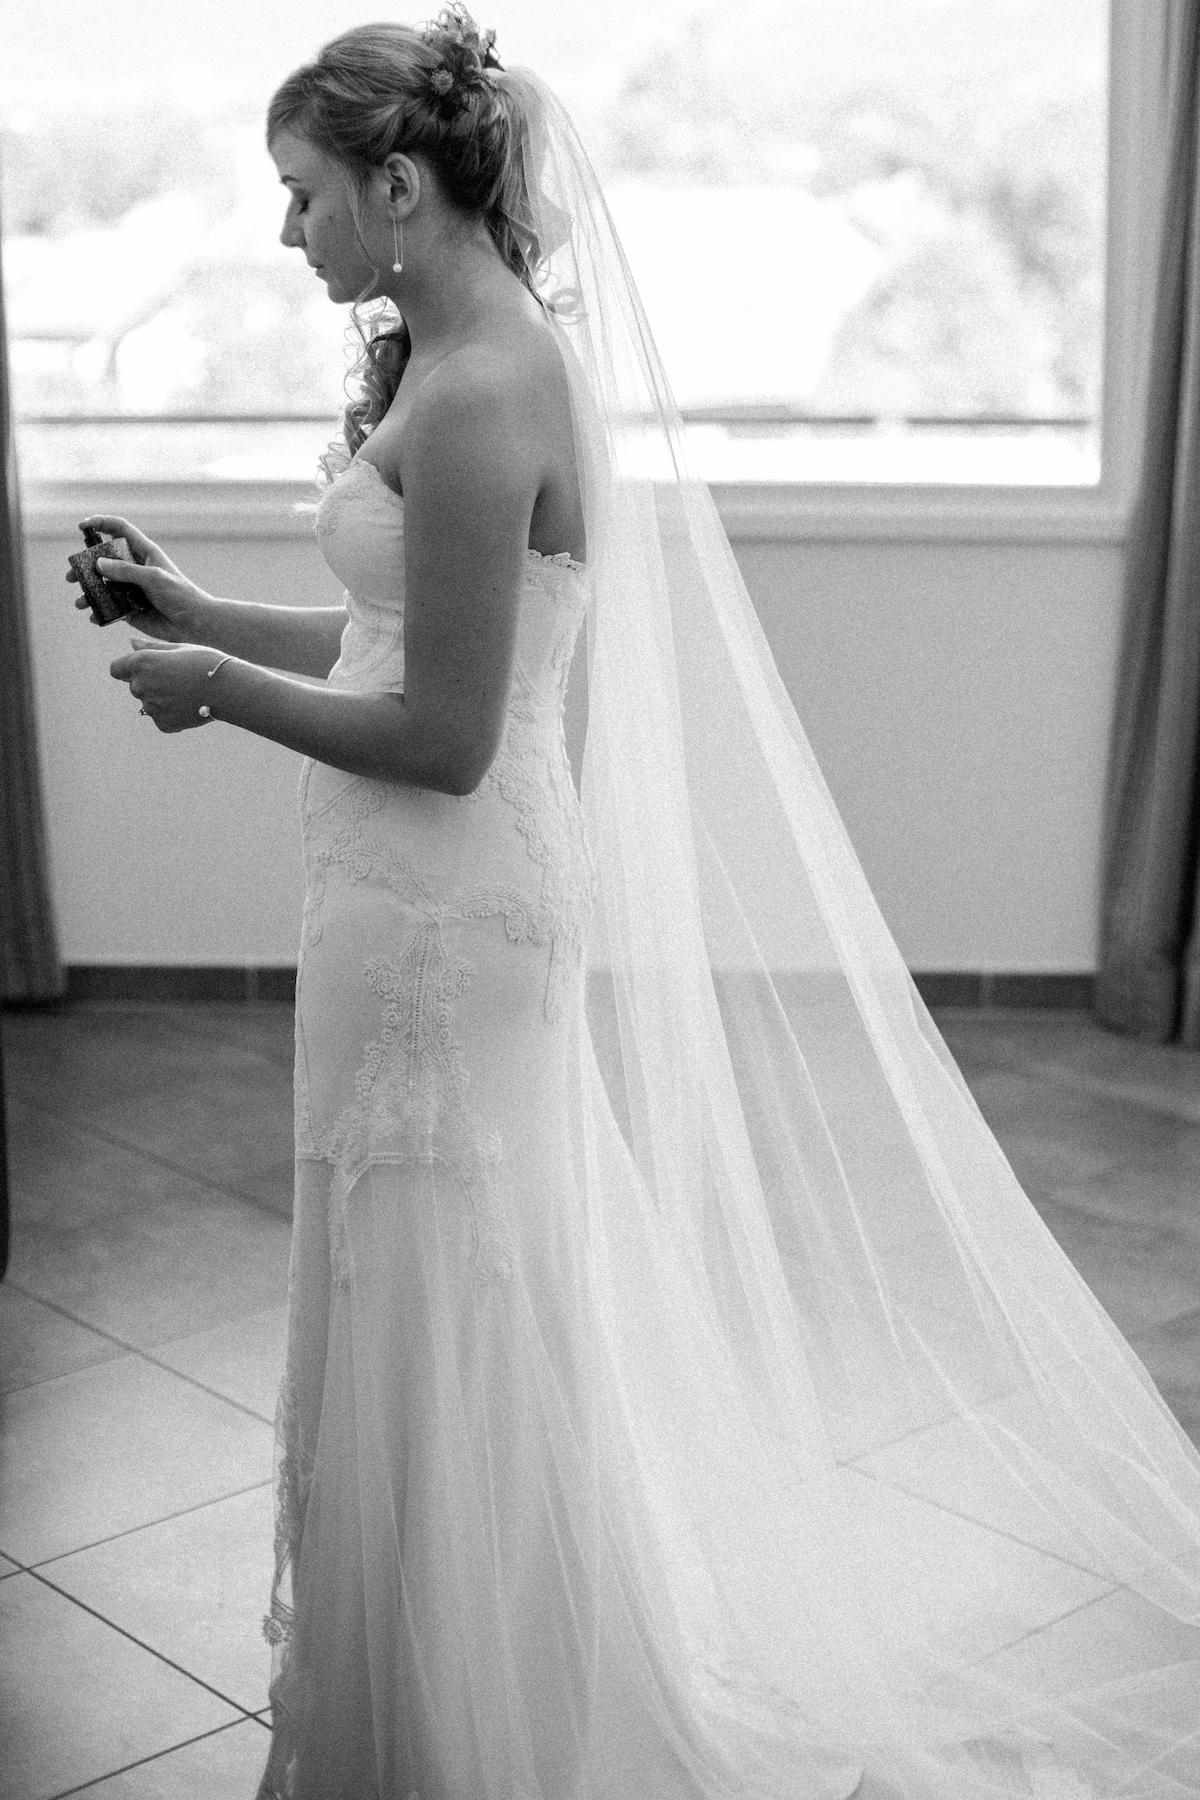 annecy-wedding-photos-82.jpg